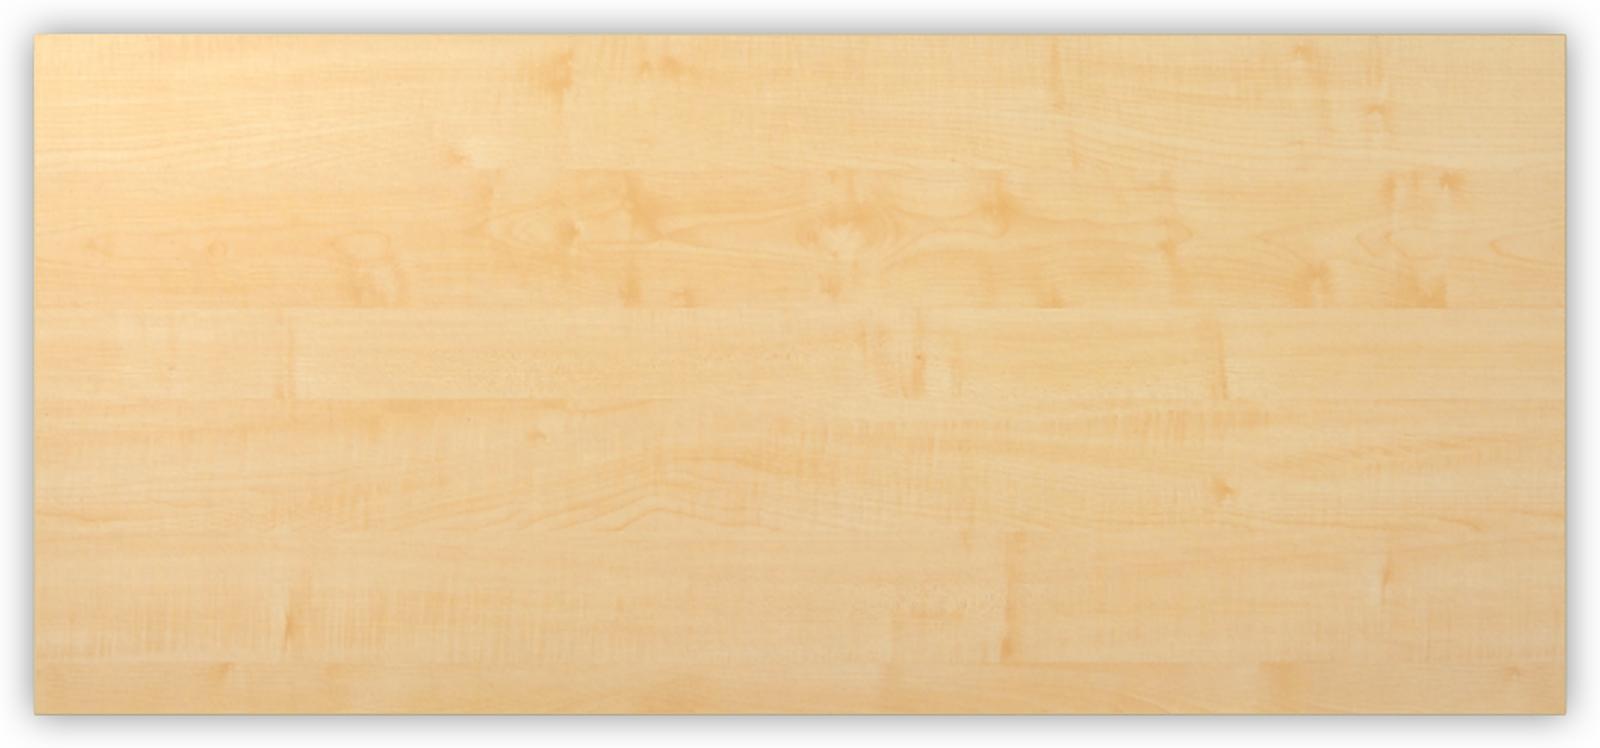 Schreibtischplatte tischplatte b rotischplatte holzplatte for Buche schreibtischplatte